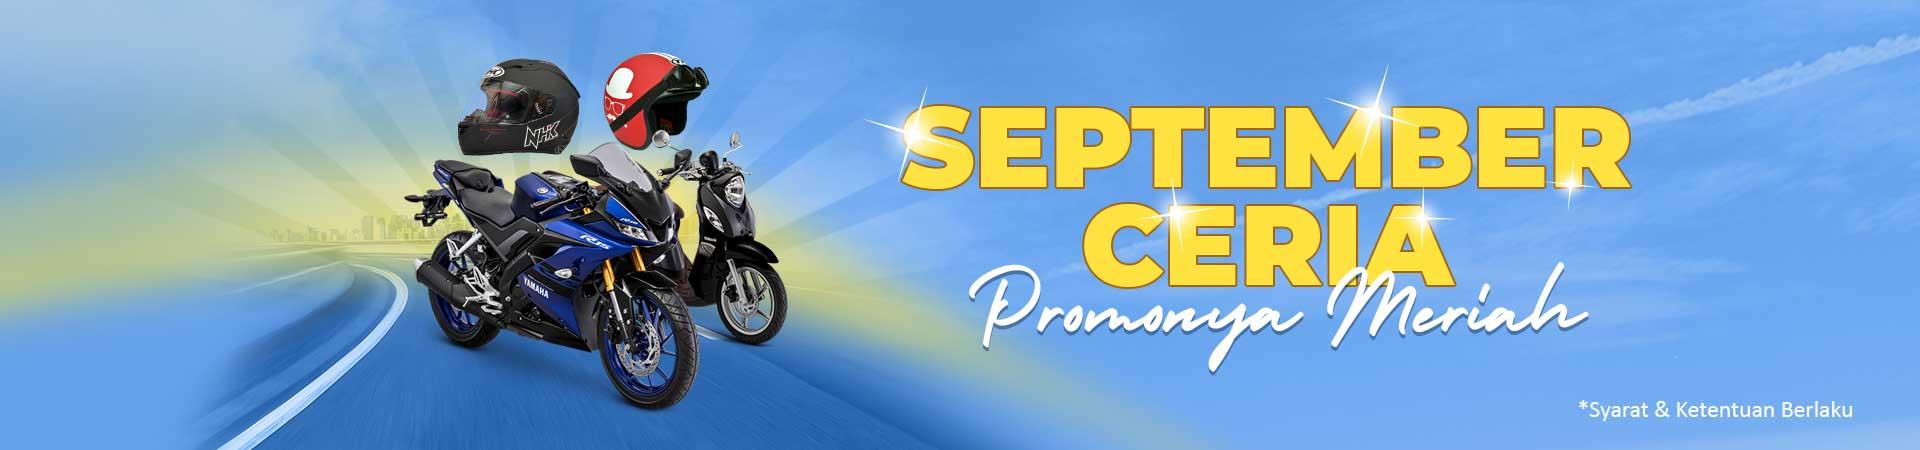 September Ceria Promonya Meriah! Diskon DP Motor Hingga 2,8 Juta!